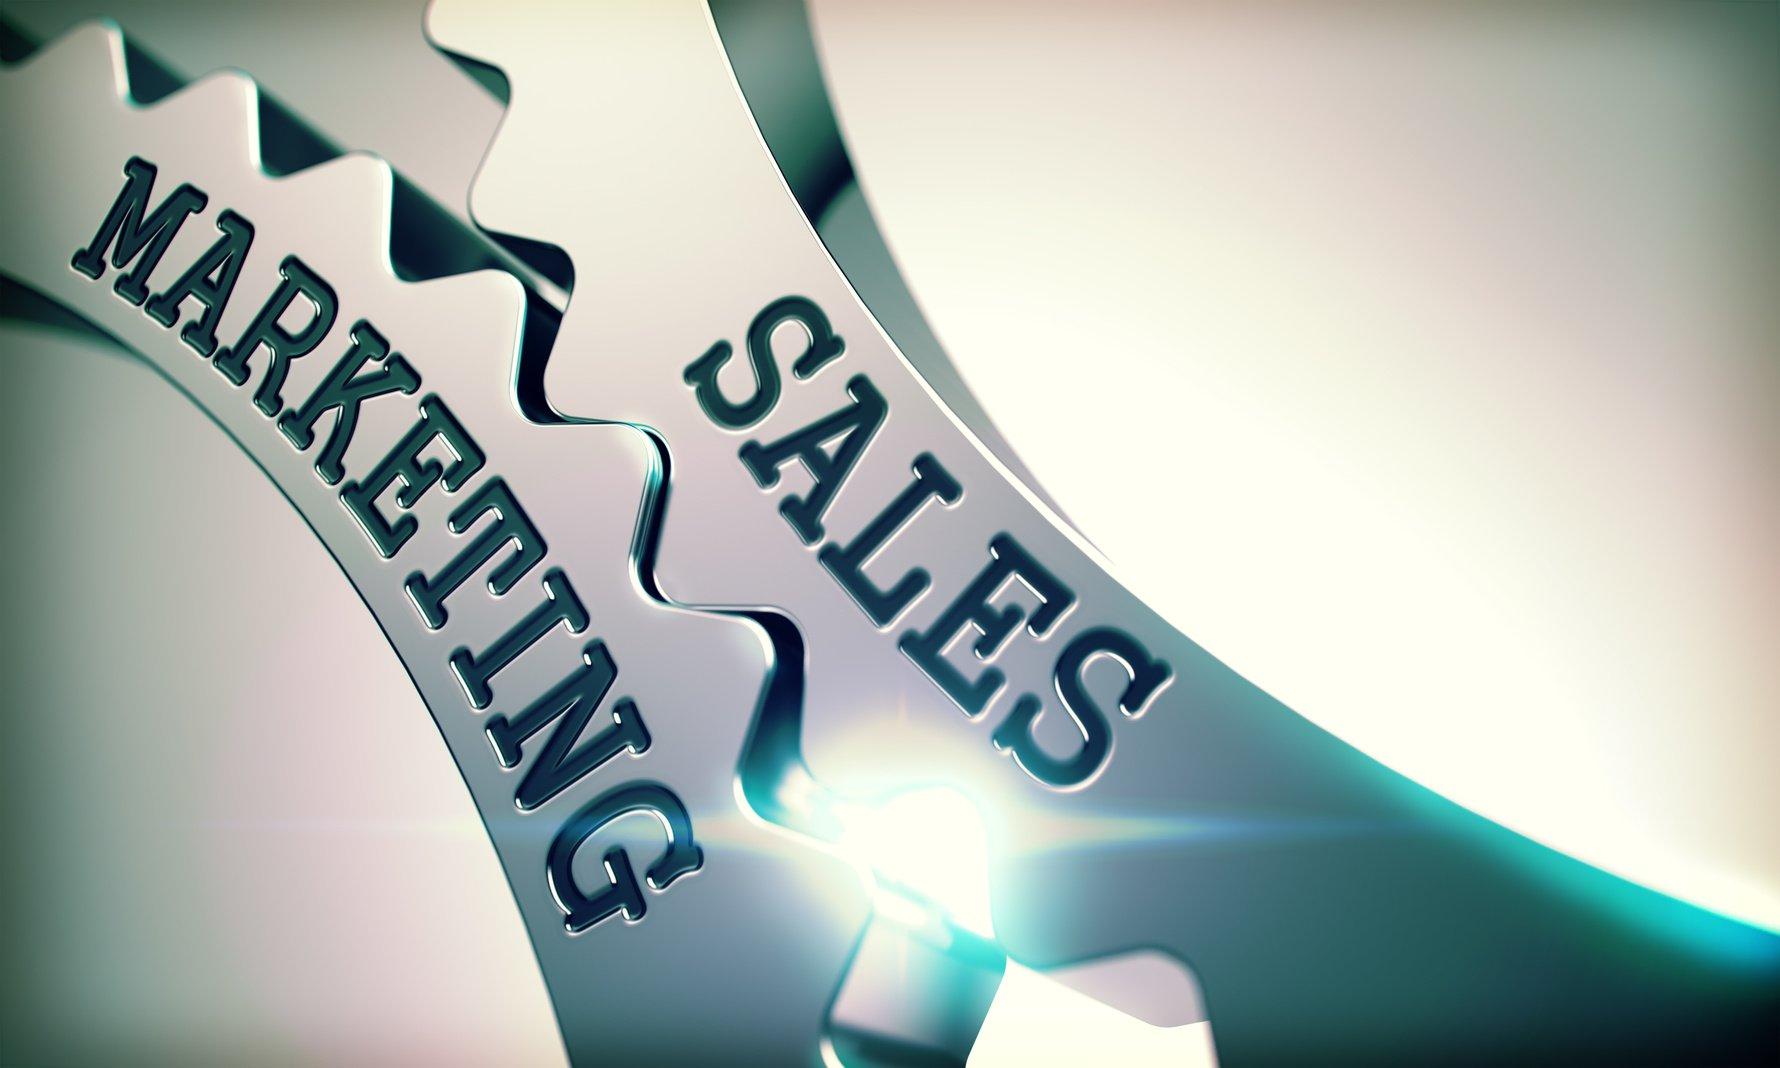 SAP Sales and Distribution (SAP SD) SAP Customer Relationship Management (SAP CRM)